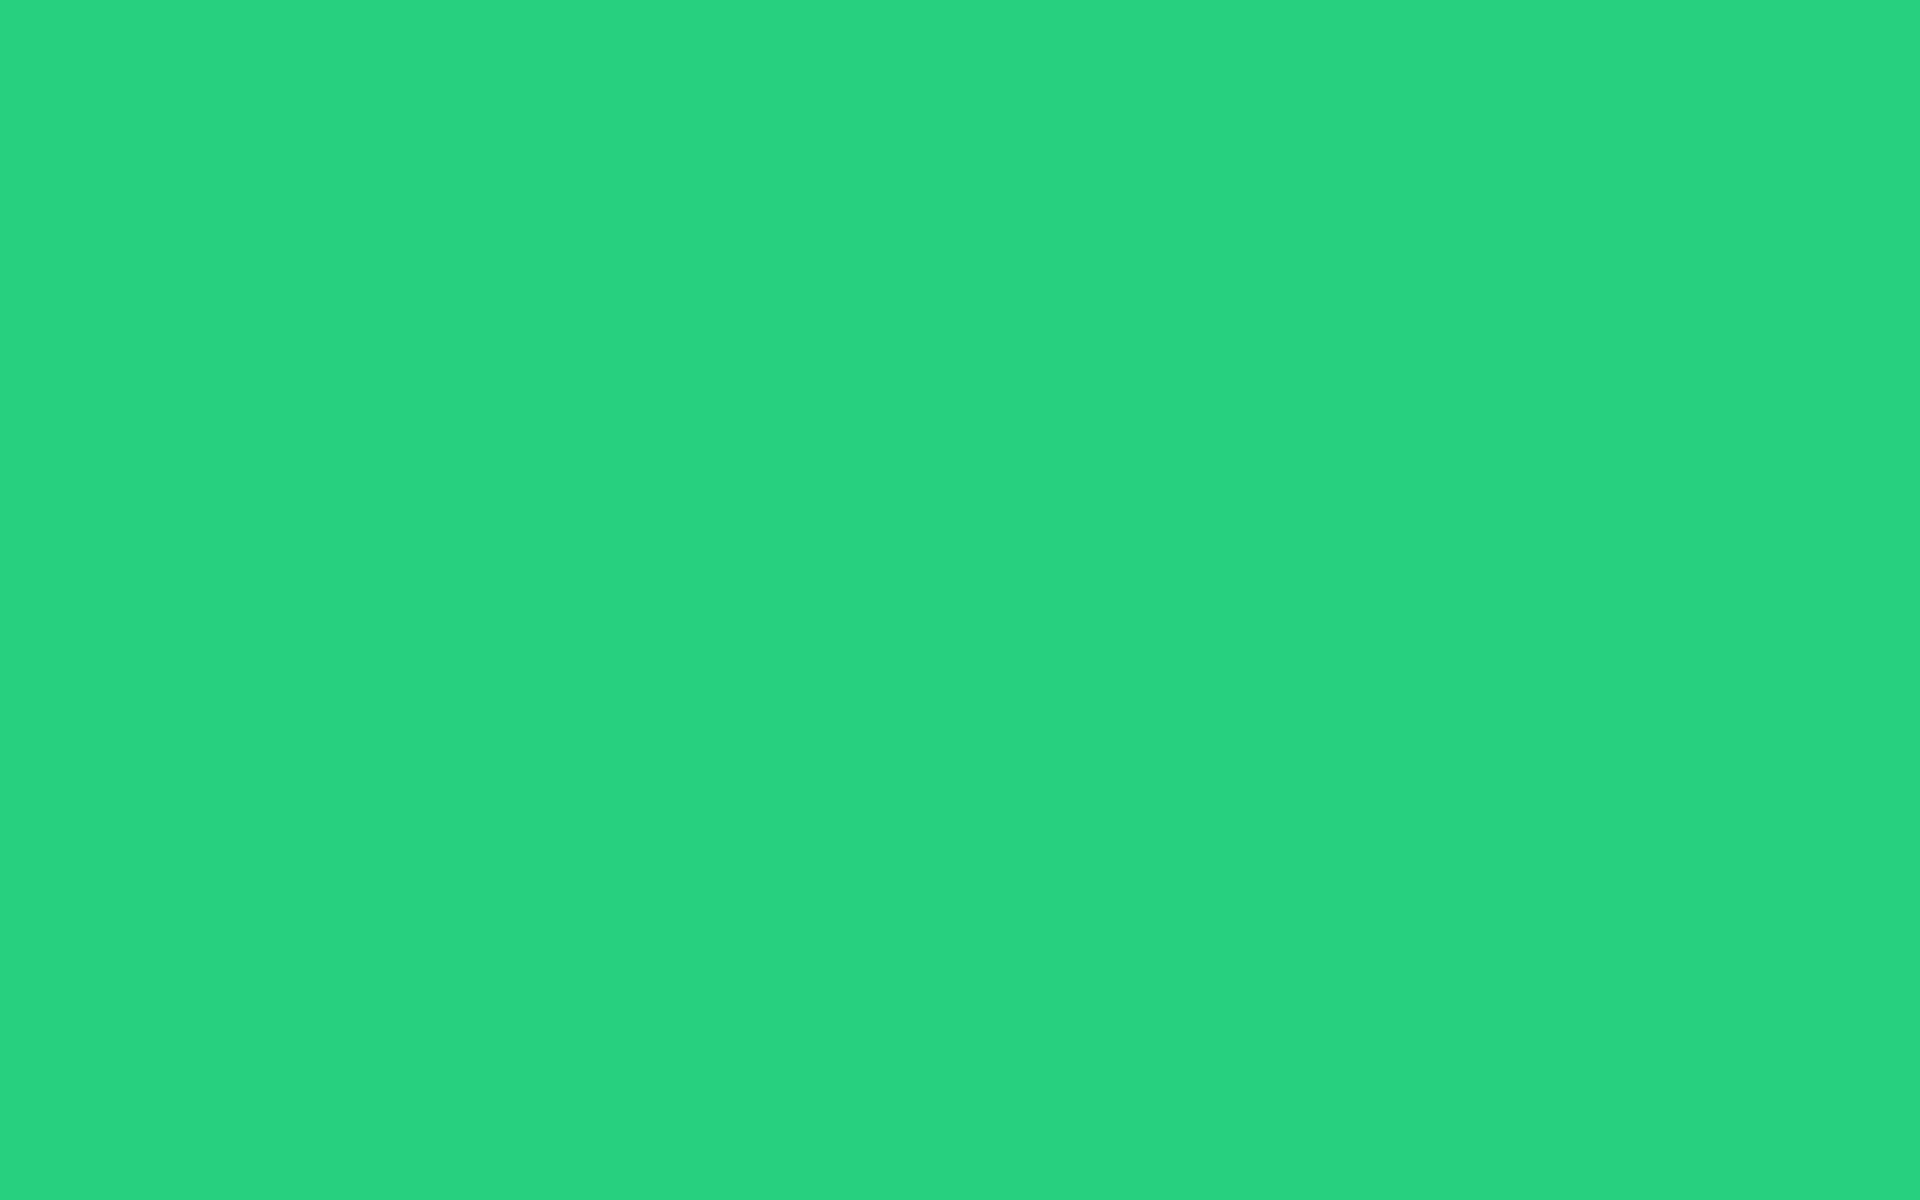 Zelení - barva